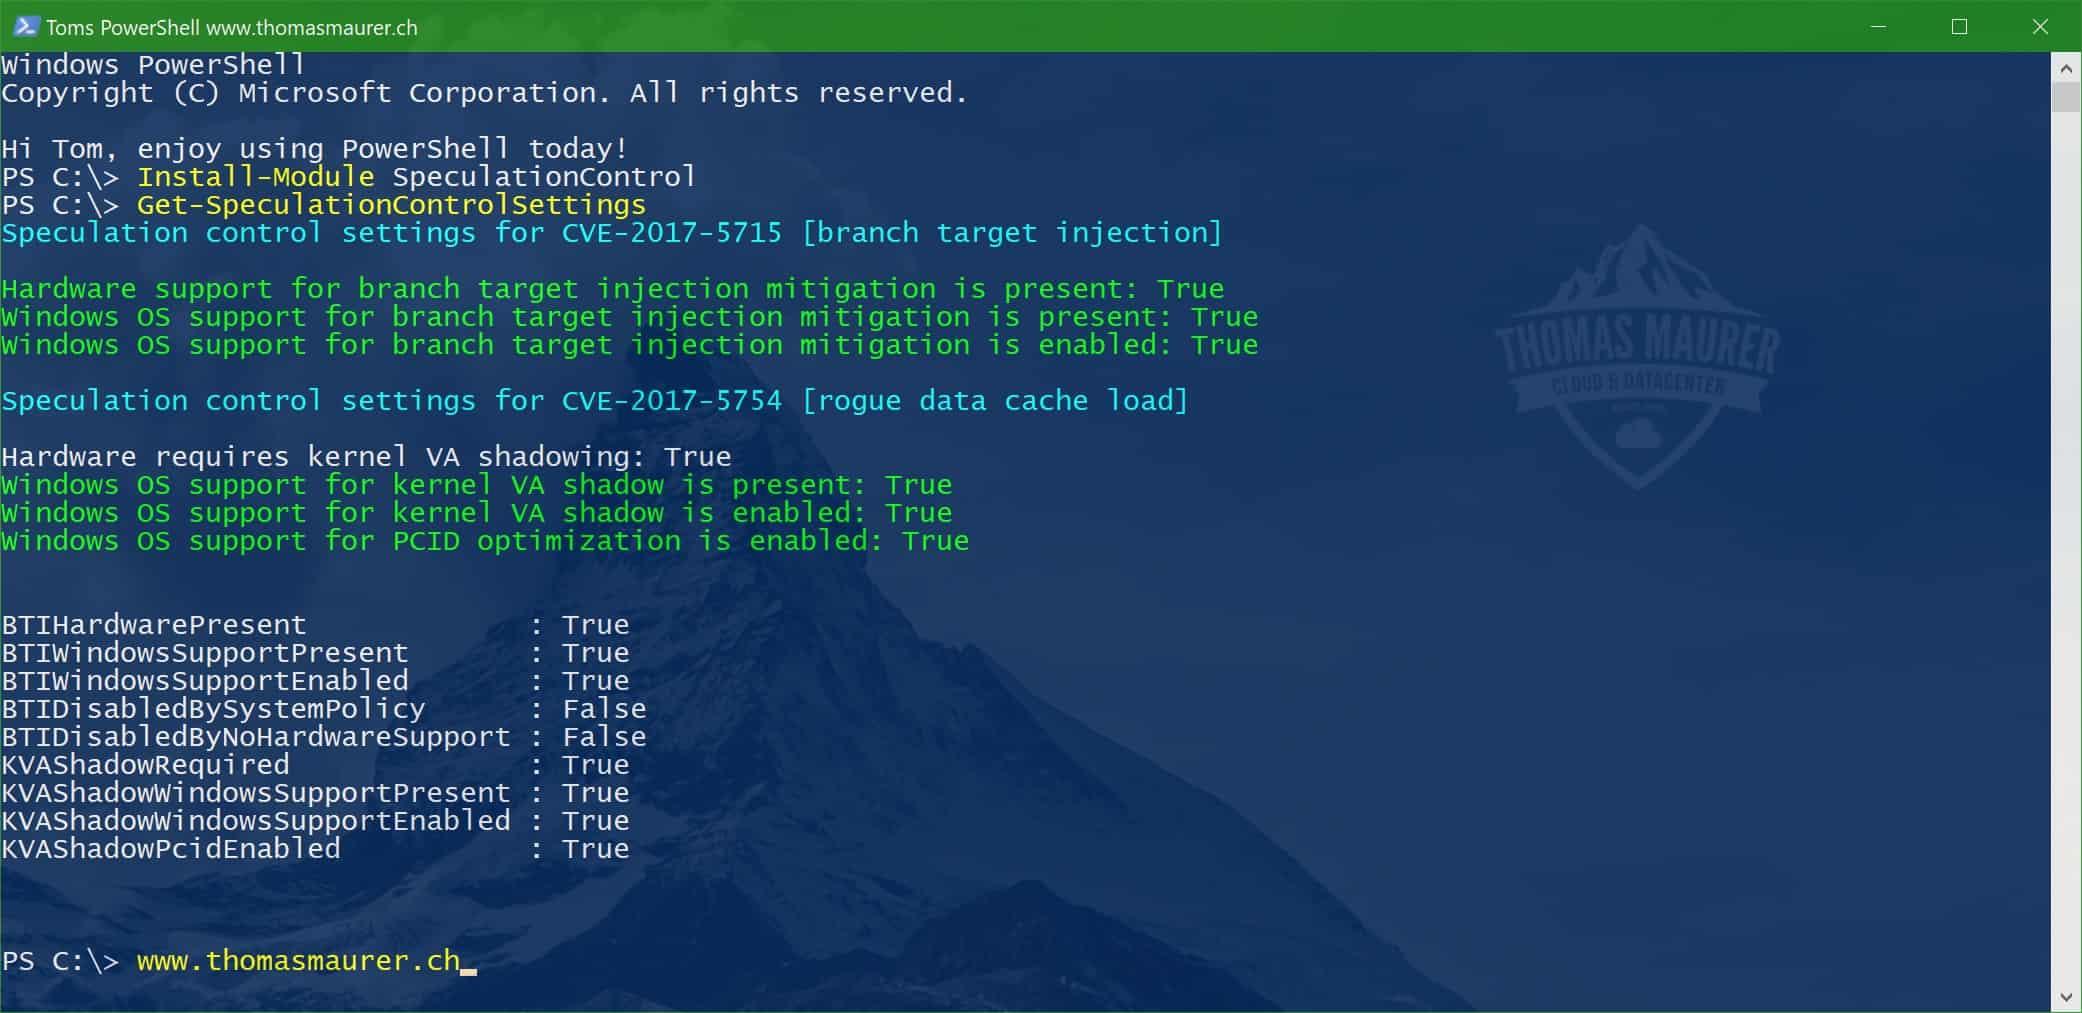 Windows SpeculationControl PowerShell